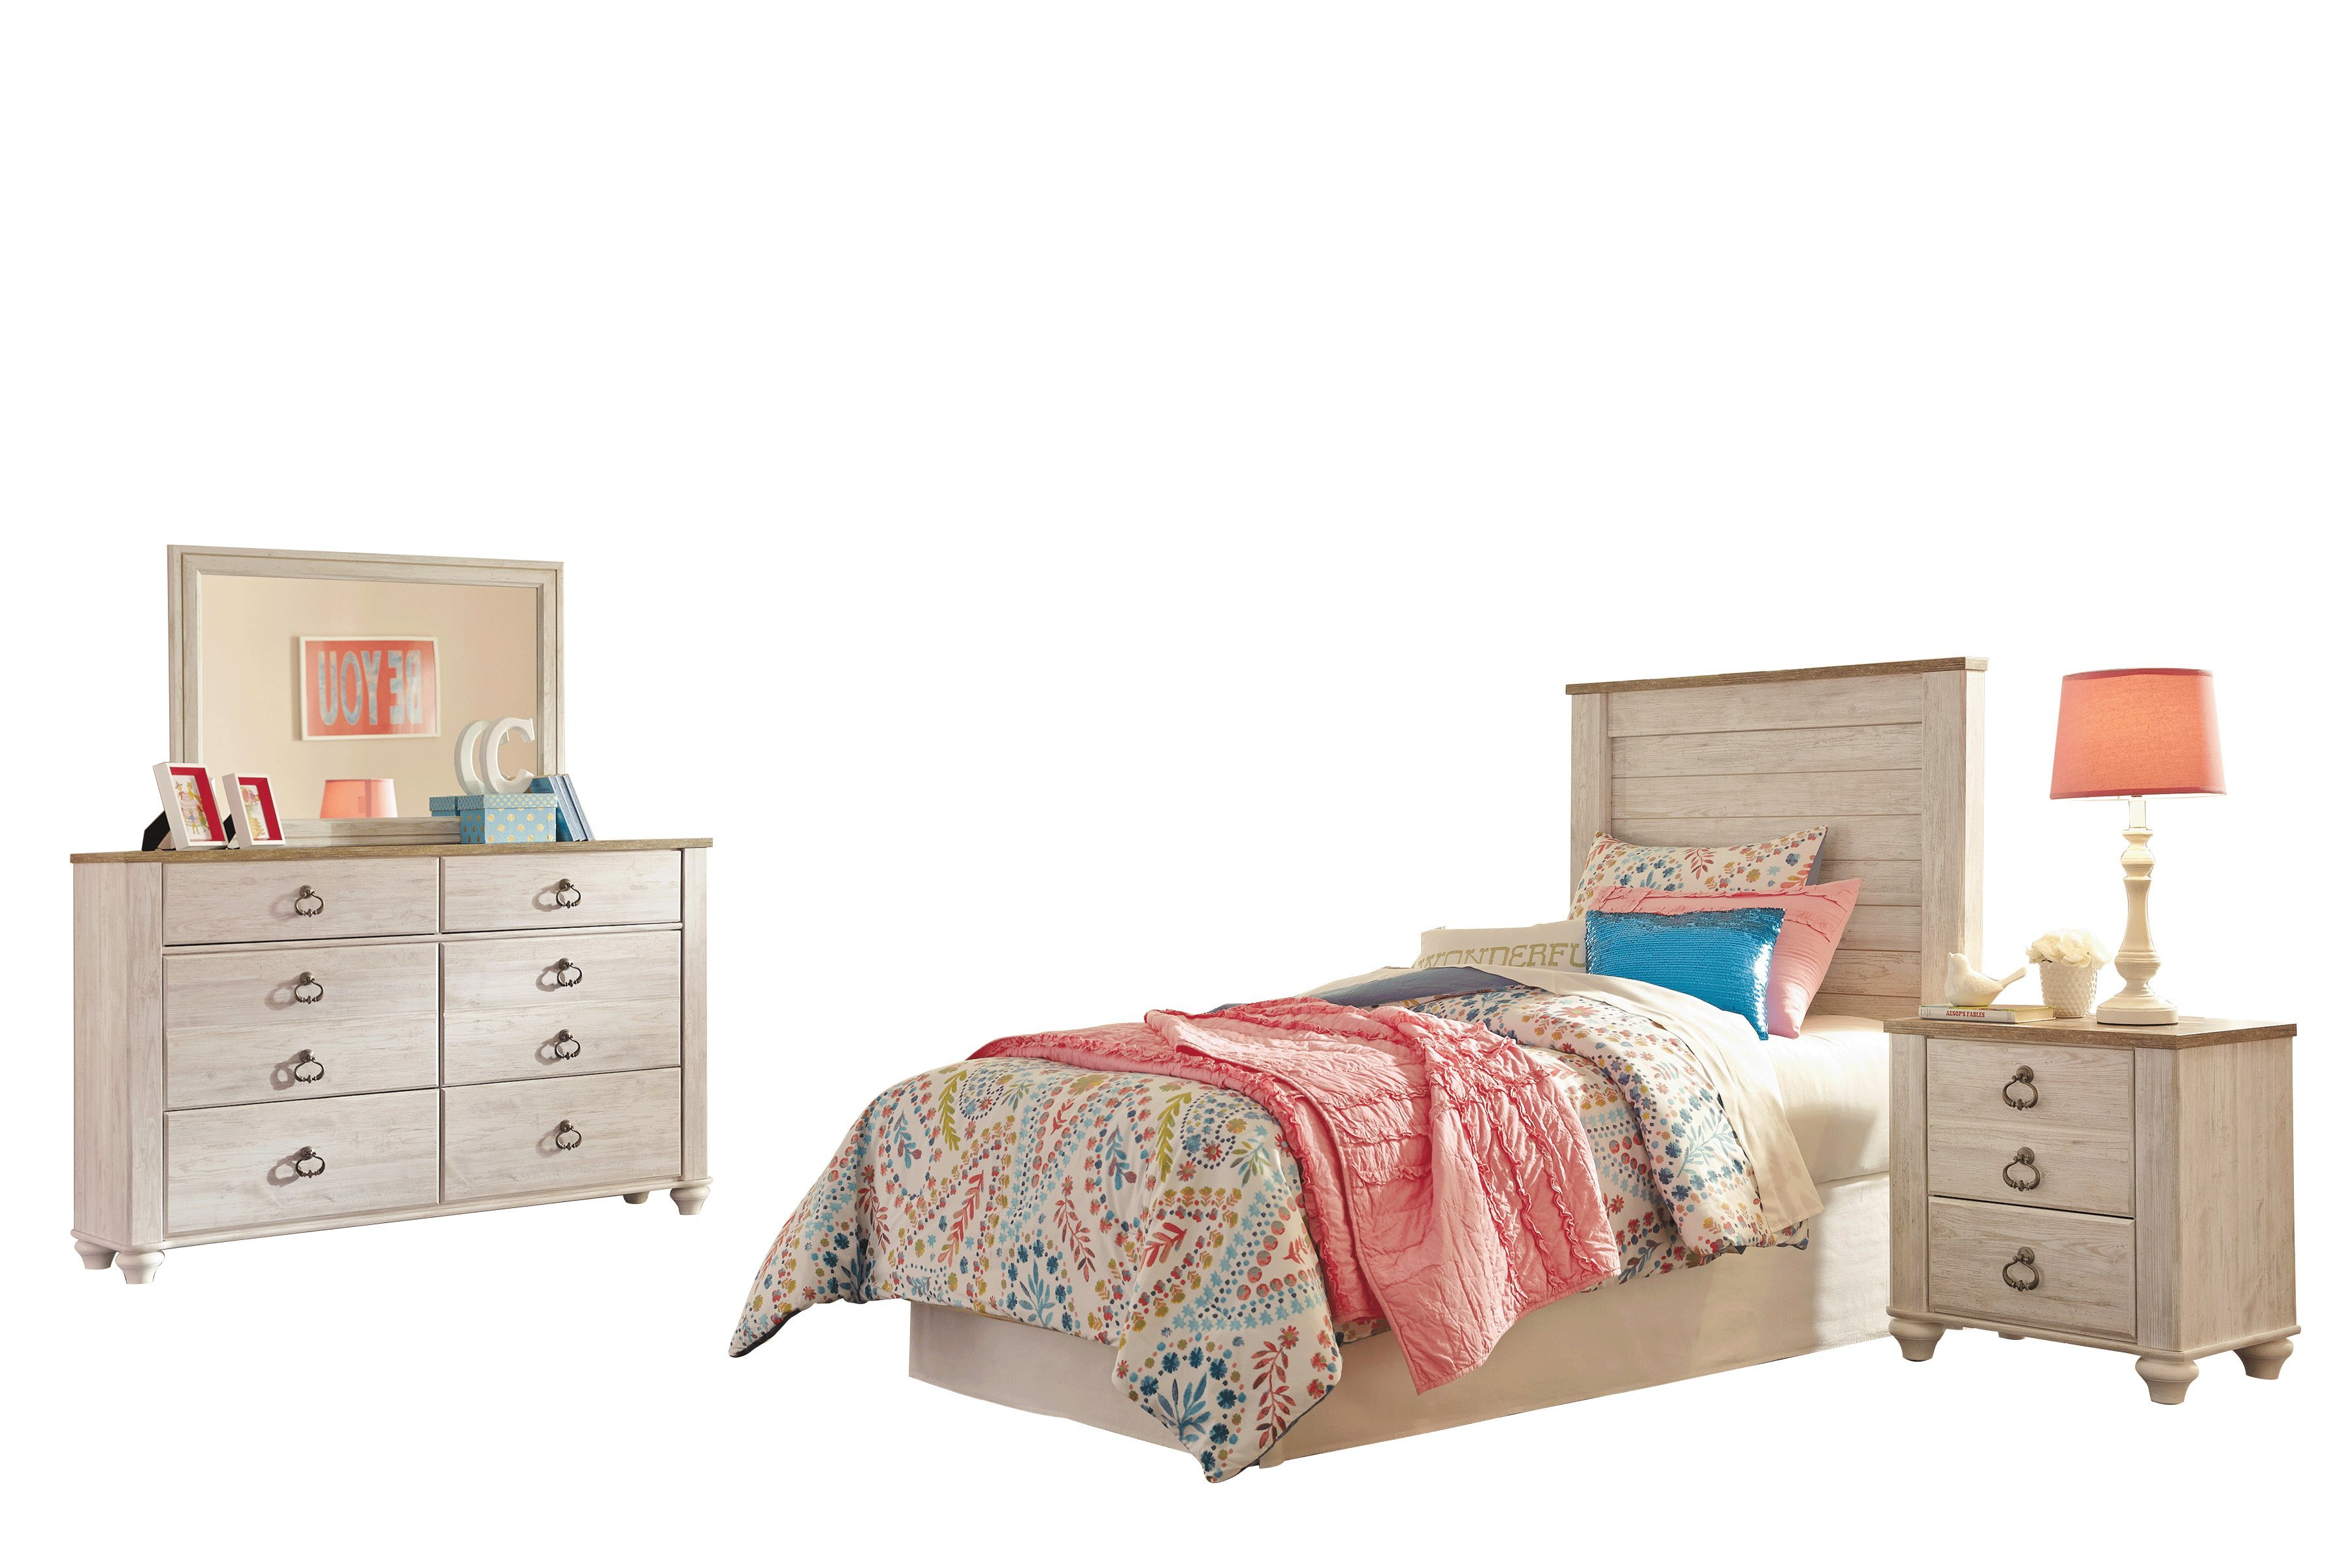 Ashley Furniture Willowton 4 Pc Full Panel Headboard Bedroom Set White Walmart Com Walmart Com